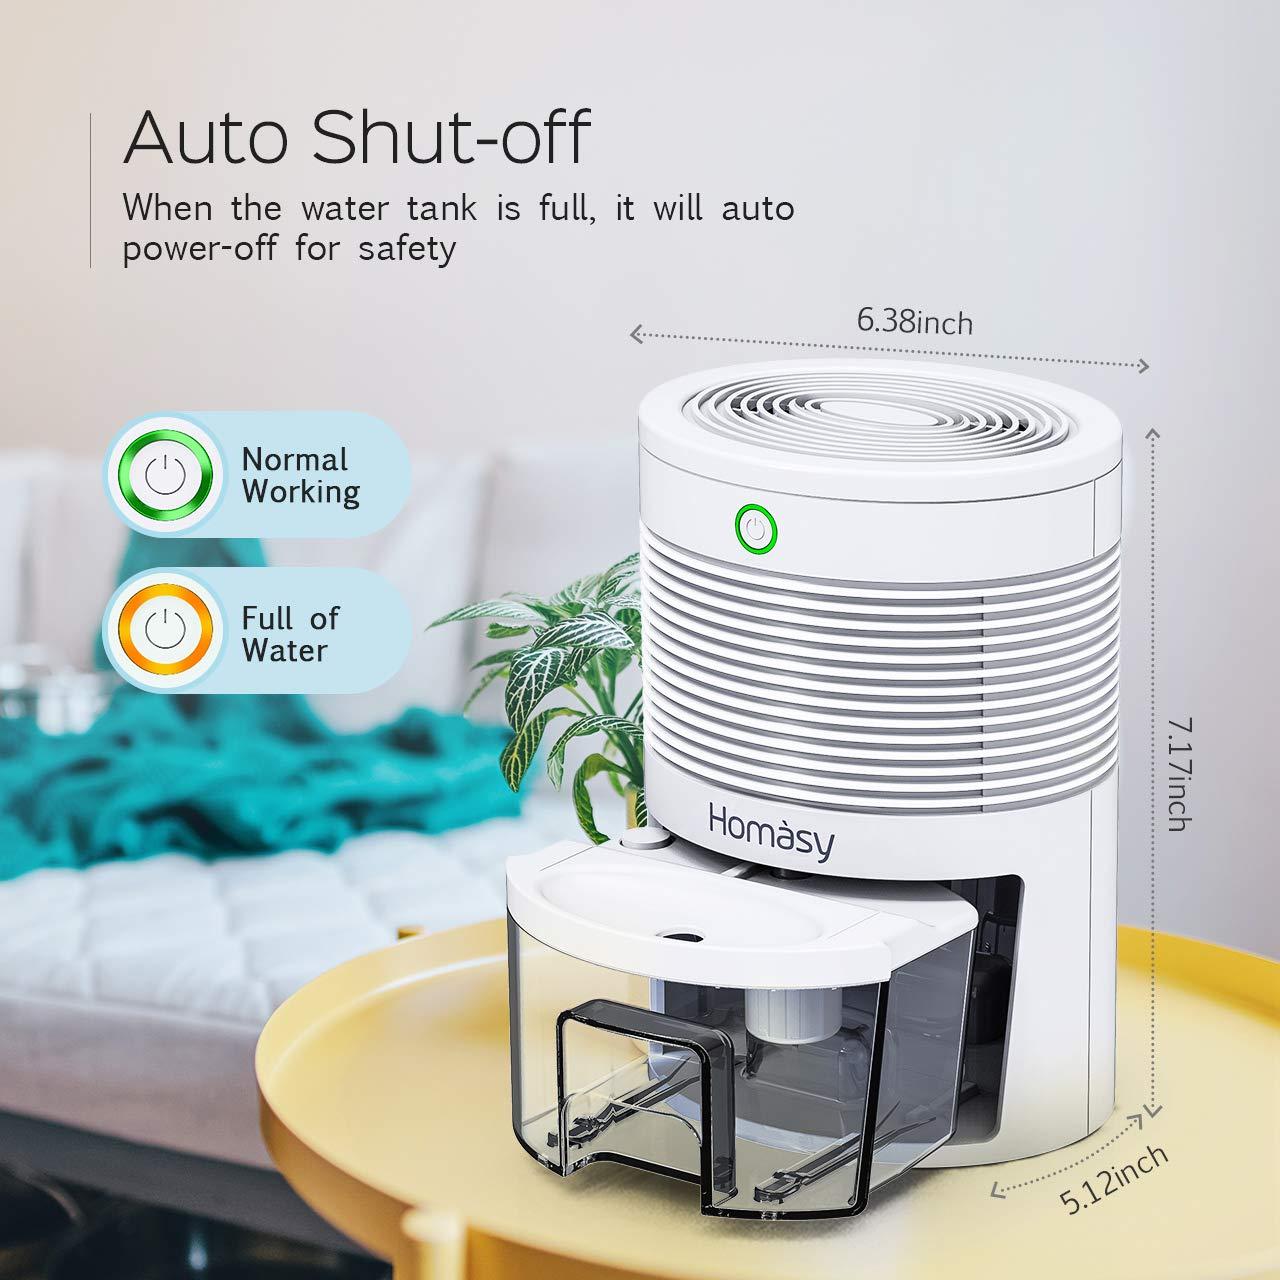 Closet 2200 Cubic Feet Bedroom RV Homasy Mini Dehumidifier Electric Small Dehumidifier Portable with Quiet Auto Off Compact Design for Bathroom 220 sq ft Basement